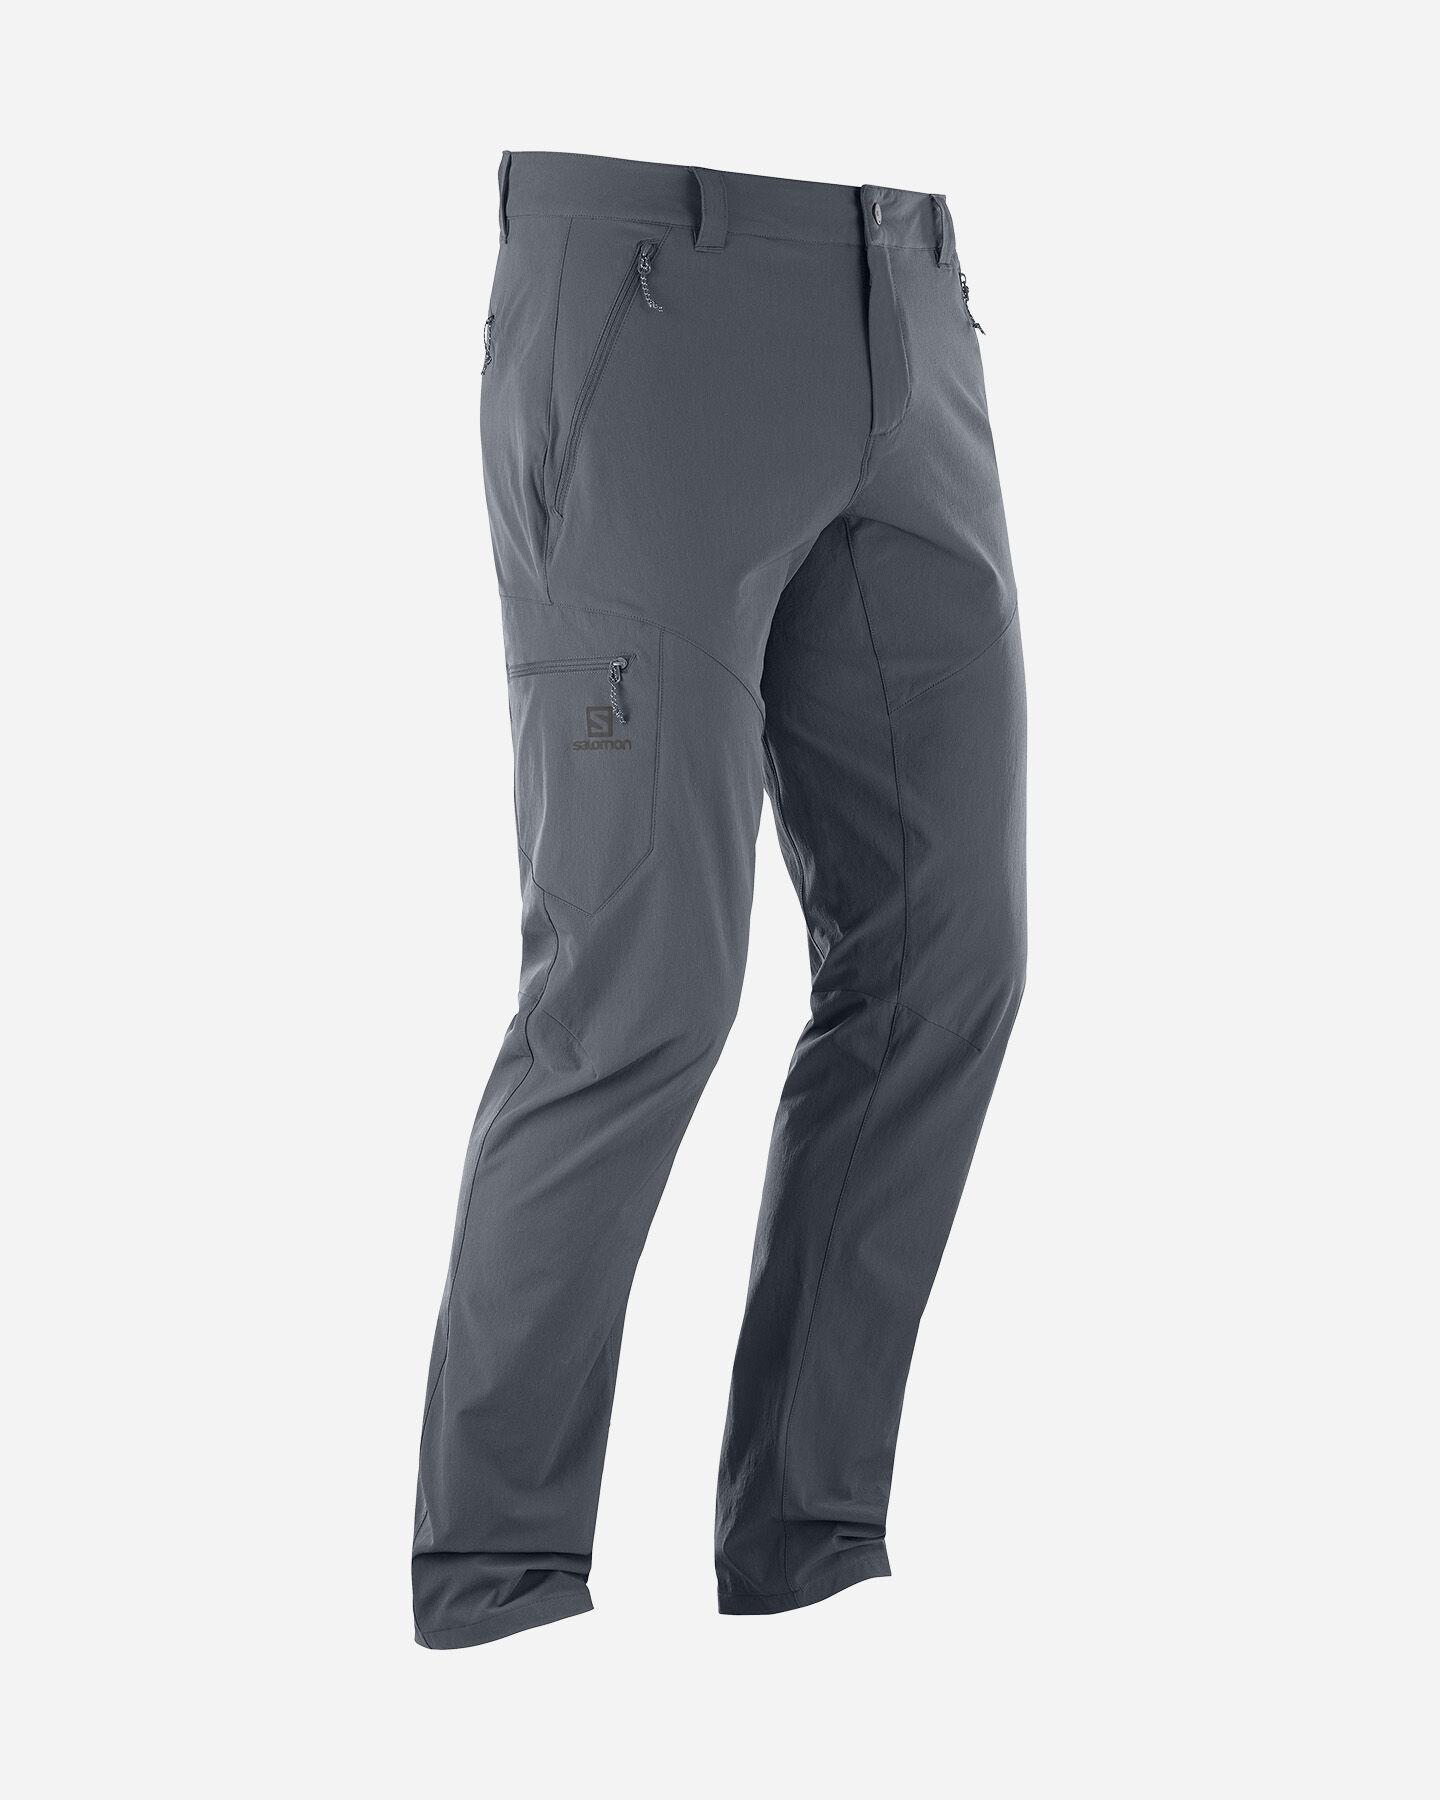 Pantalone outdoor SALOMON WAYFARER M S5173871 scatto 1